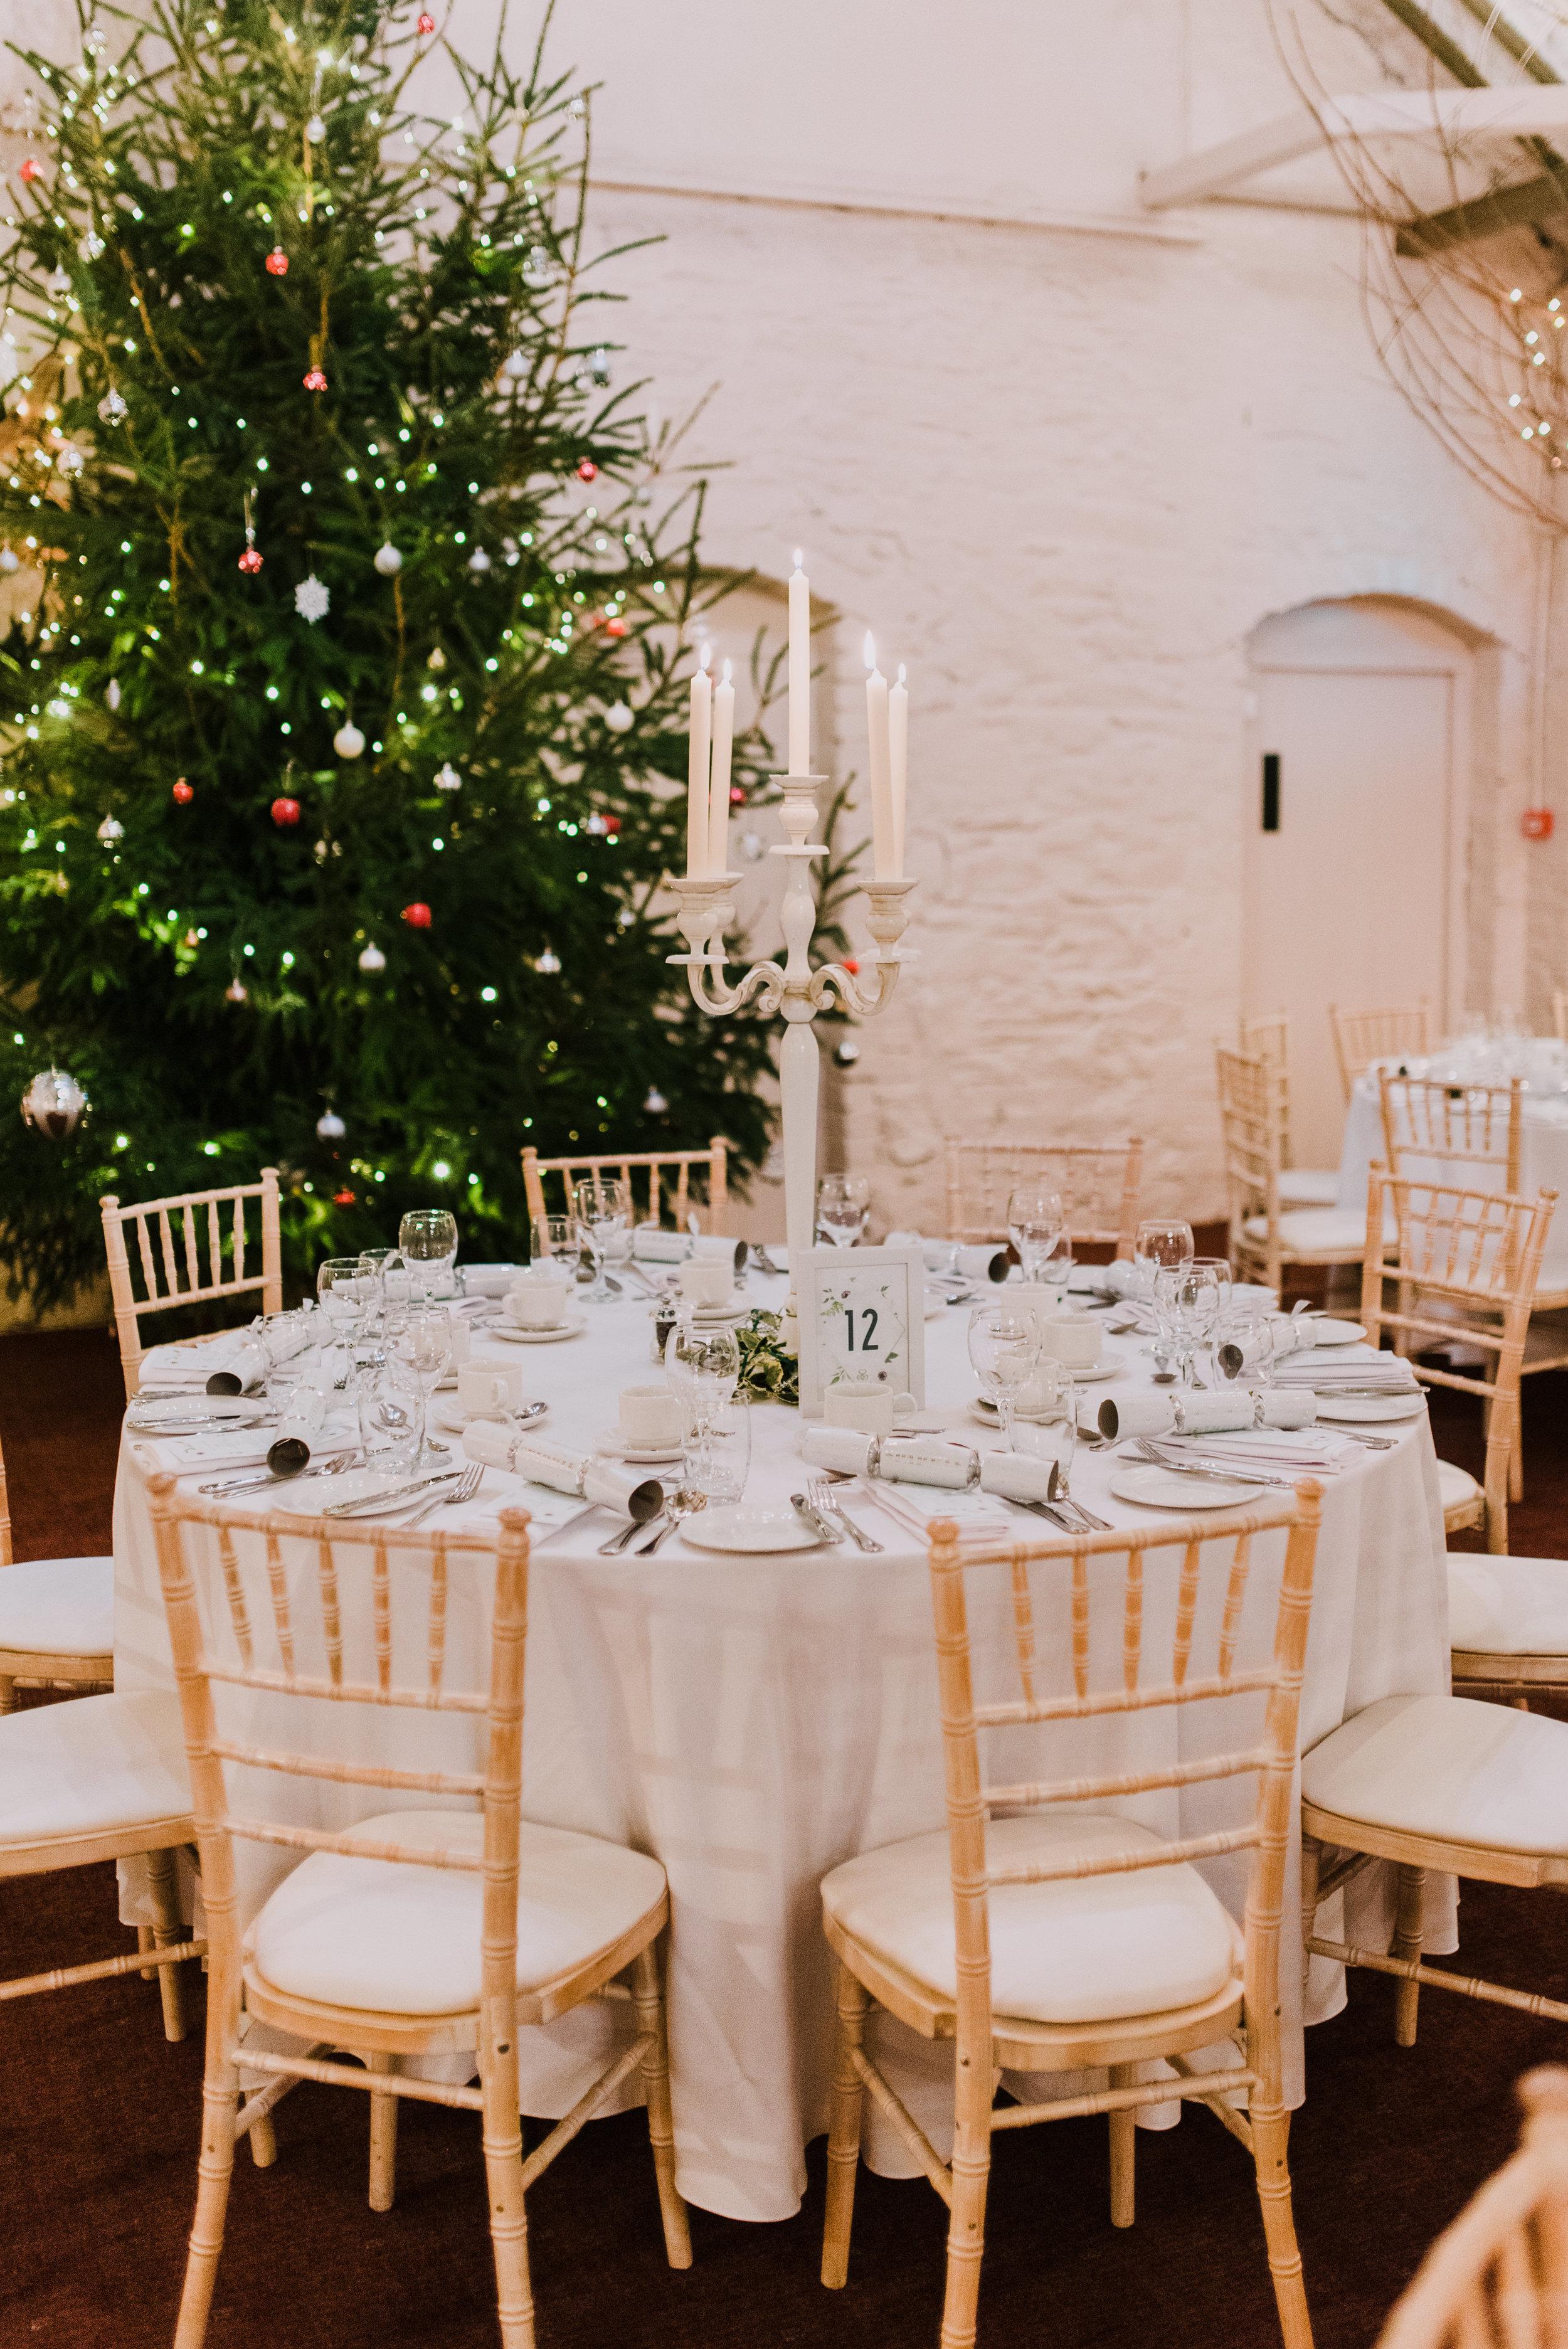 larchfield estate wedding, wedding venues northern ireland, barn wedding venues northern ireland, wedding photos larchfield estate, shane todd wedding, larchfield wedding decor ideas (1).jpg